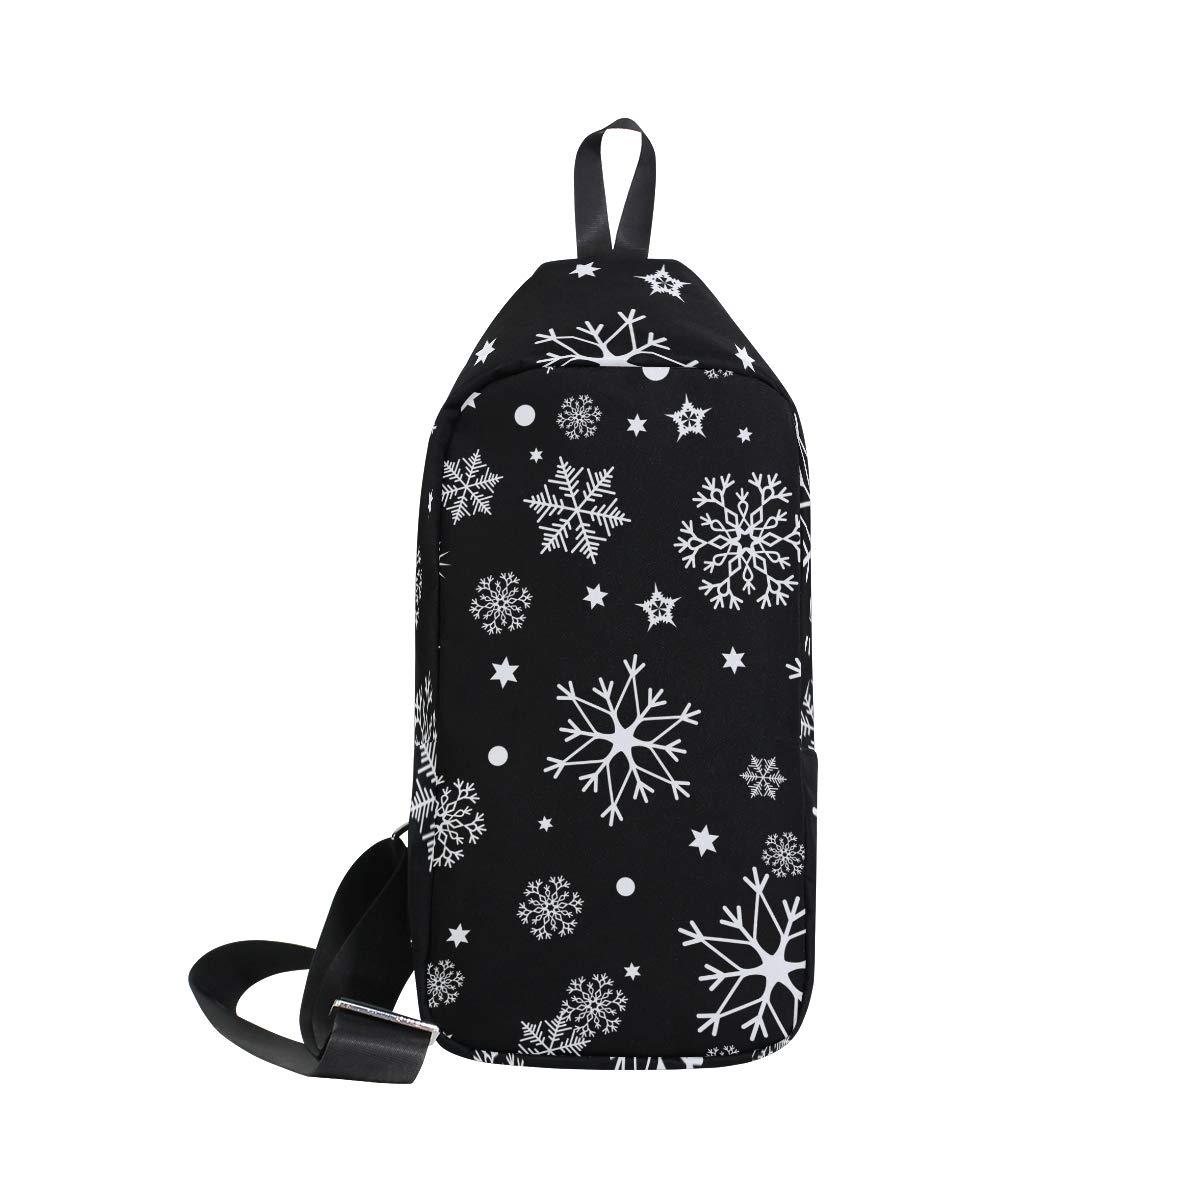 TFONE White Snowflake Pattern Crossbody Bag Lightweight Chest Shoulder Messenger Pack Backpack Sling Bag